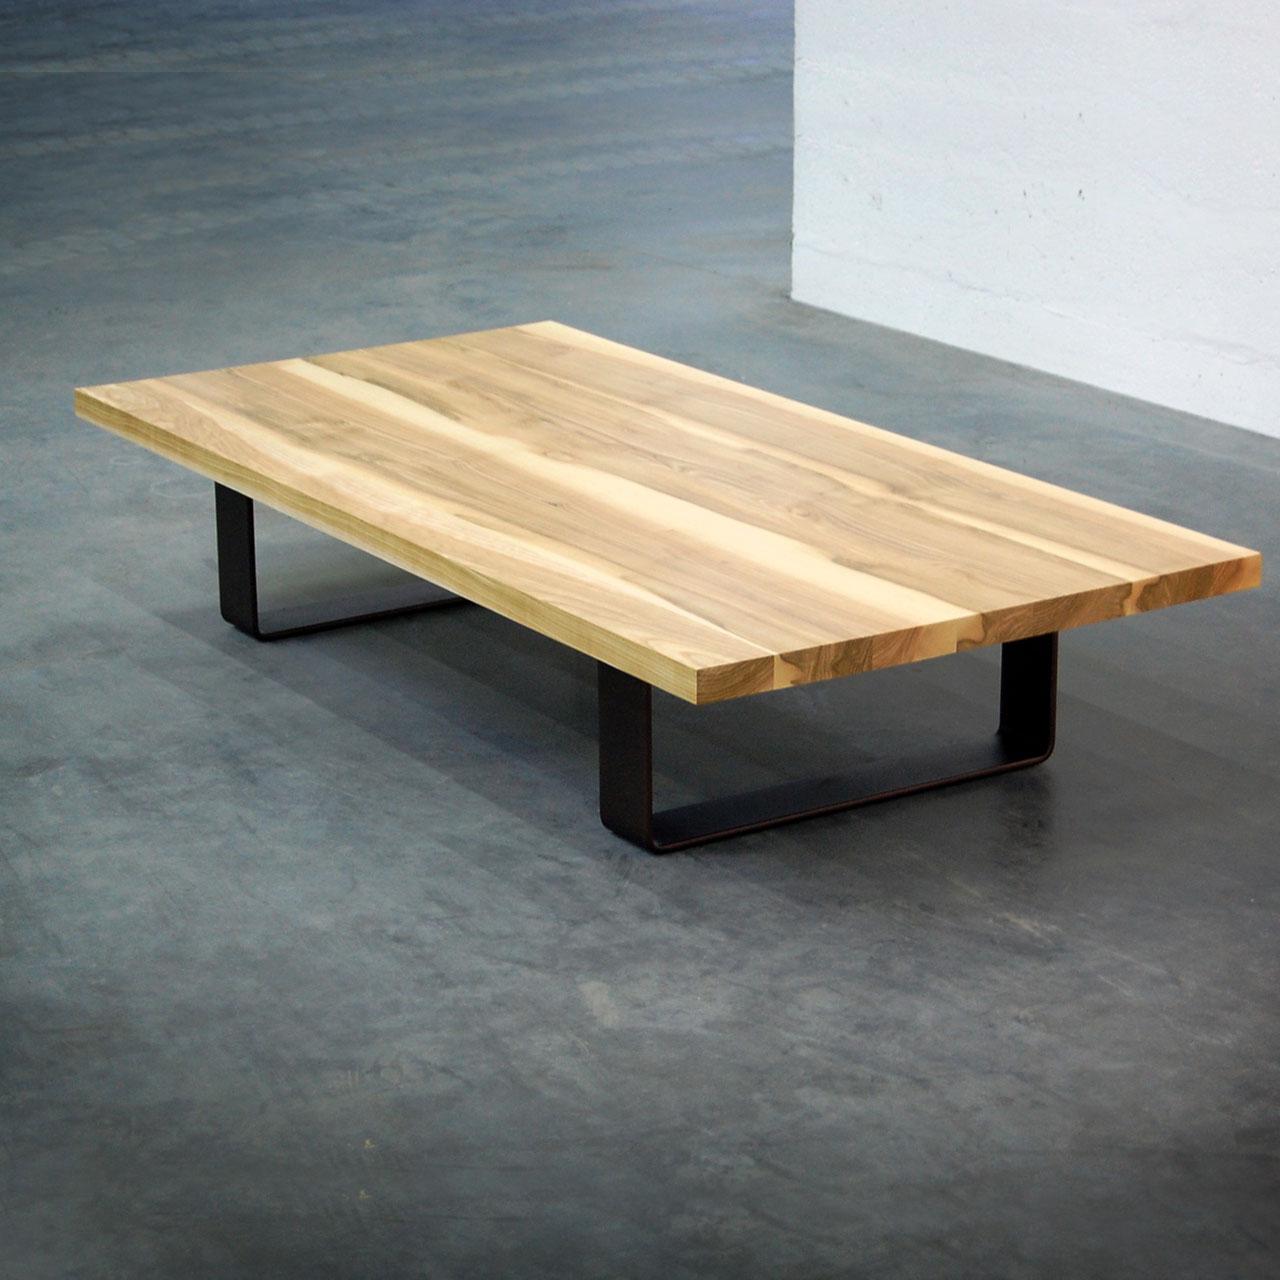 Table basse ruban artmeta mobilier sur mesure for Table basse grand format